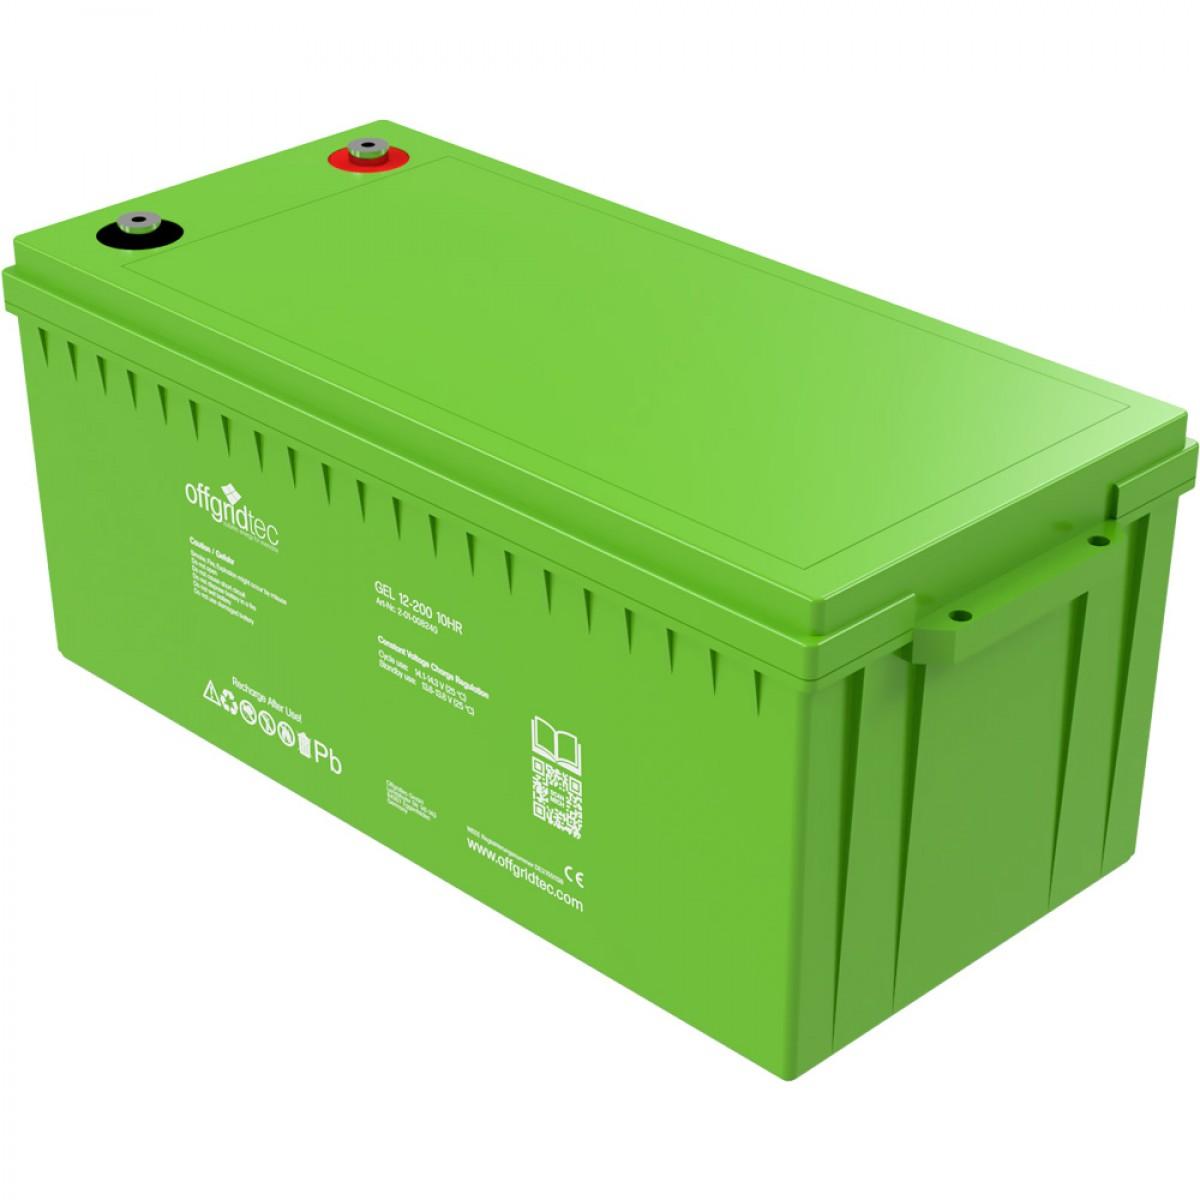 Offgridtec Gelbatterie 12V 200Ah 4